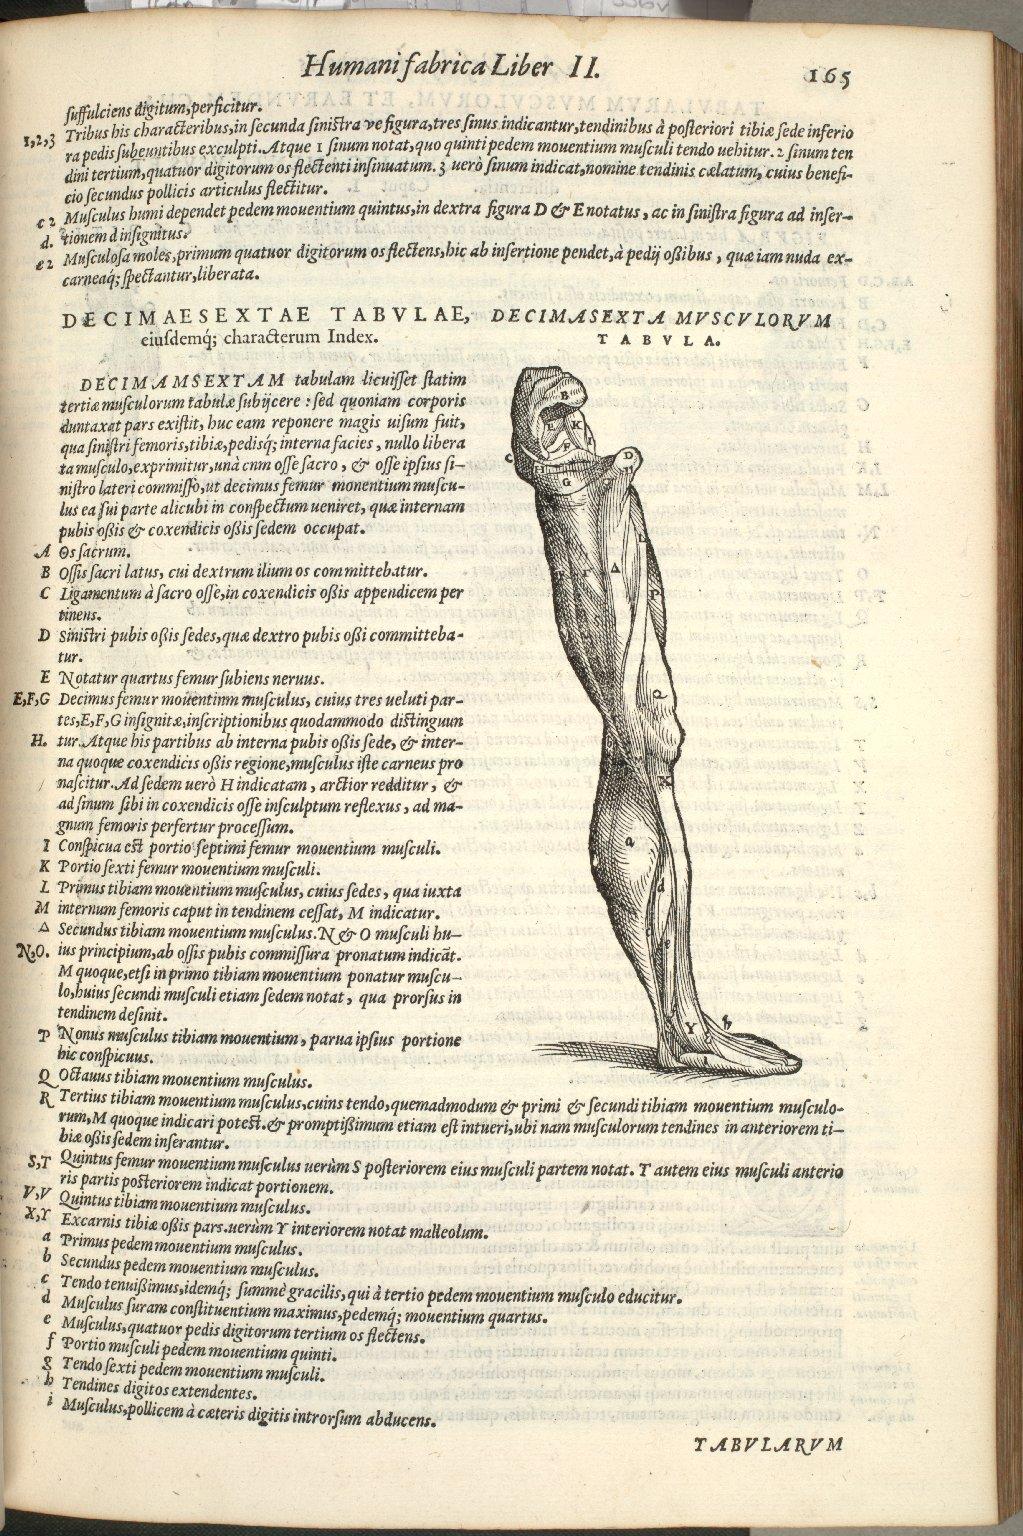 Decimasexta Musculorum Tabula